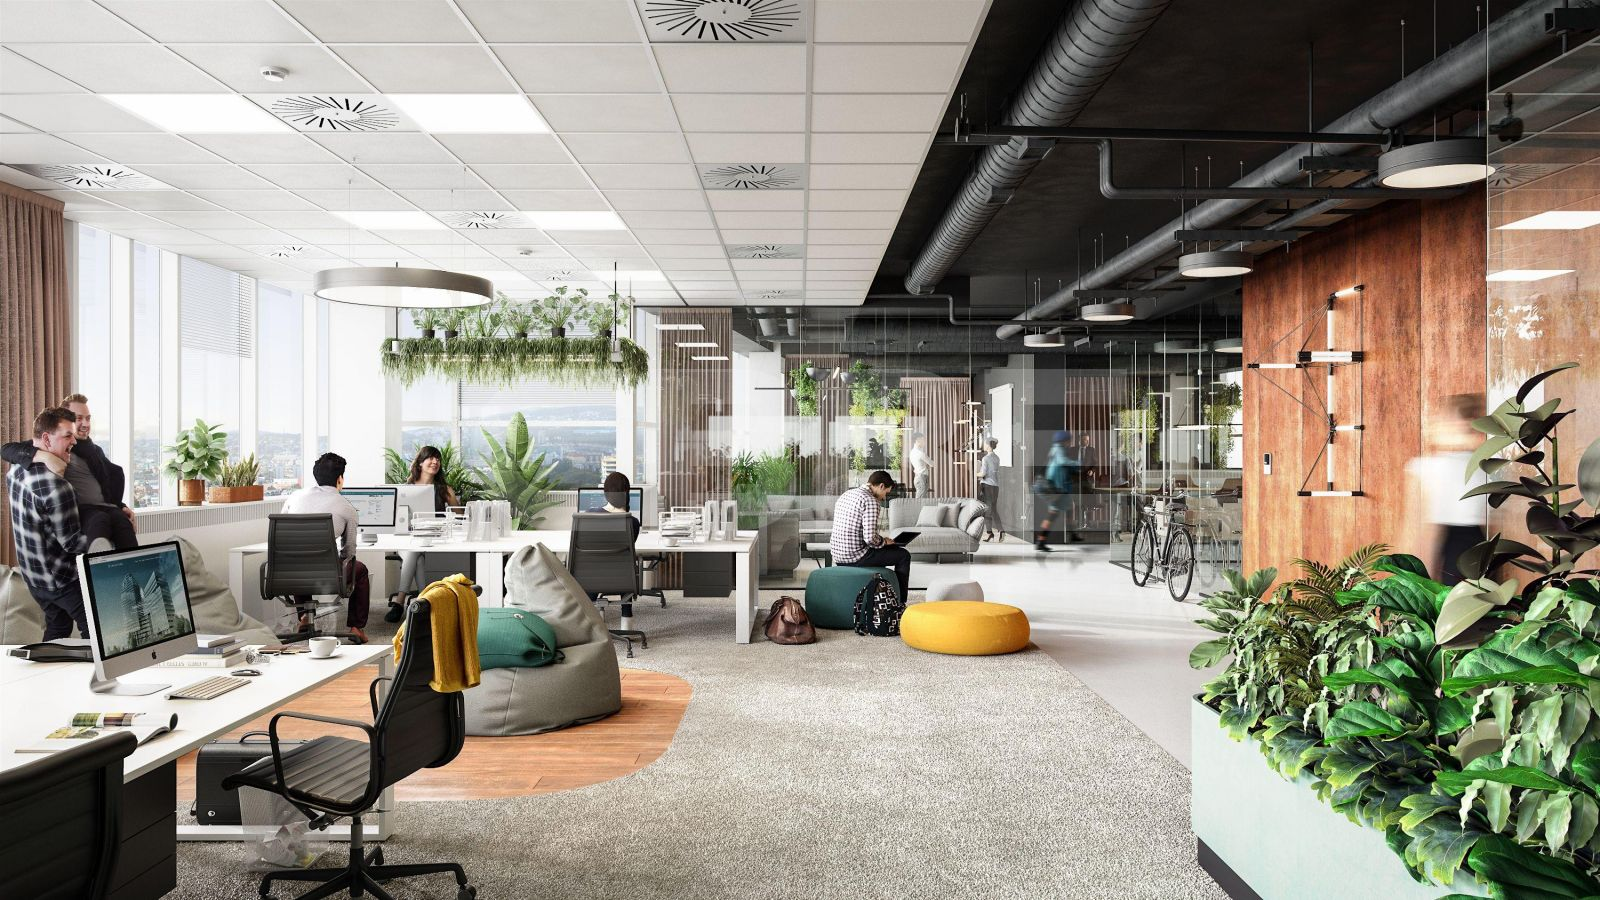 Lakeside Park 02, Bratislava - Nové Mesto | Offices for rent by CBRE | 3